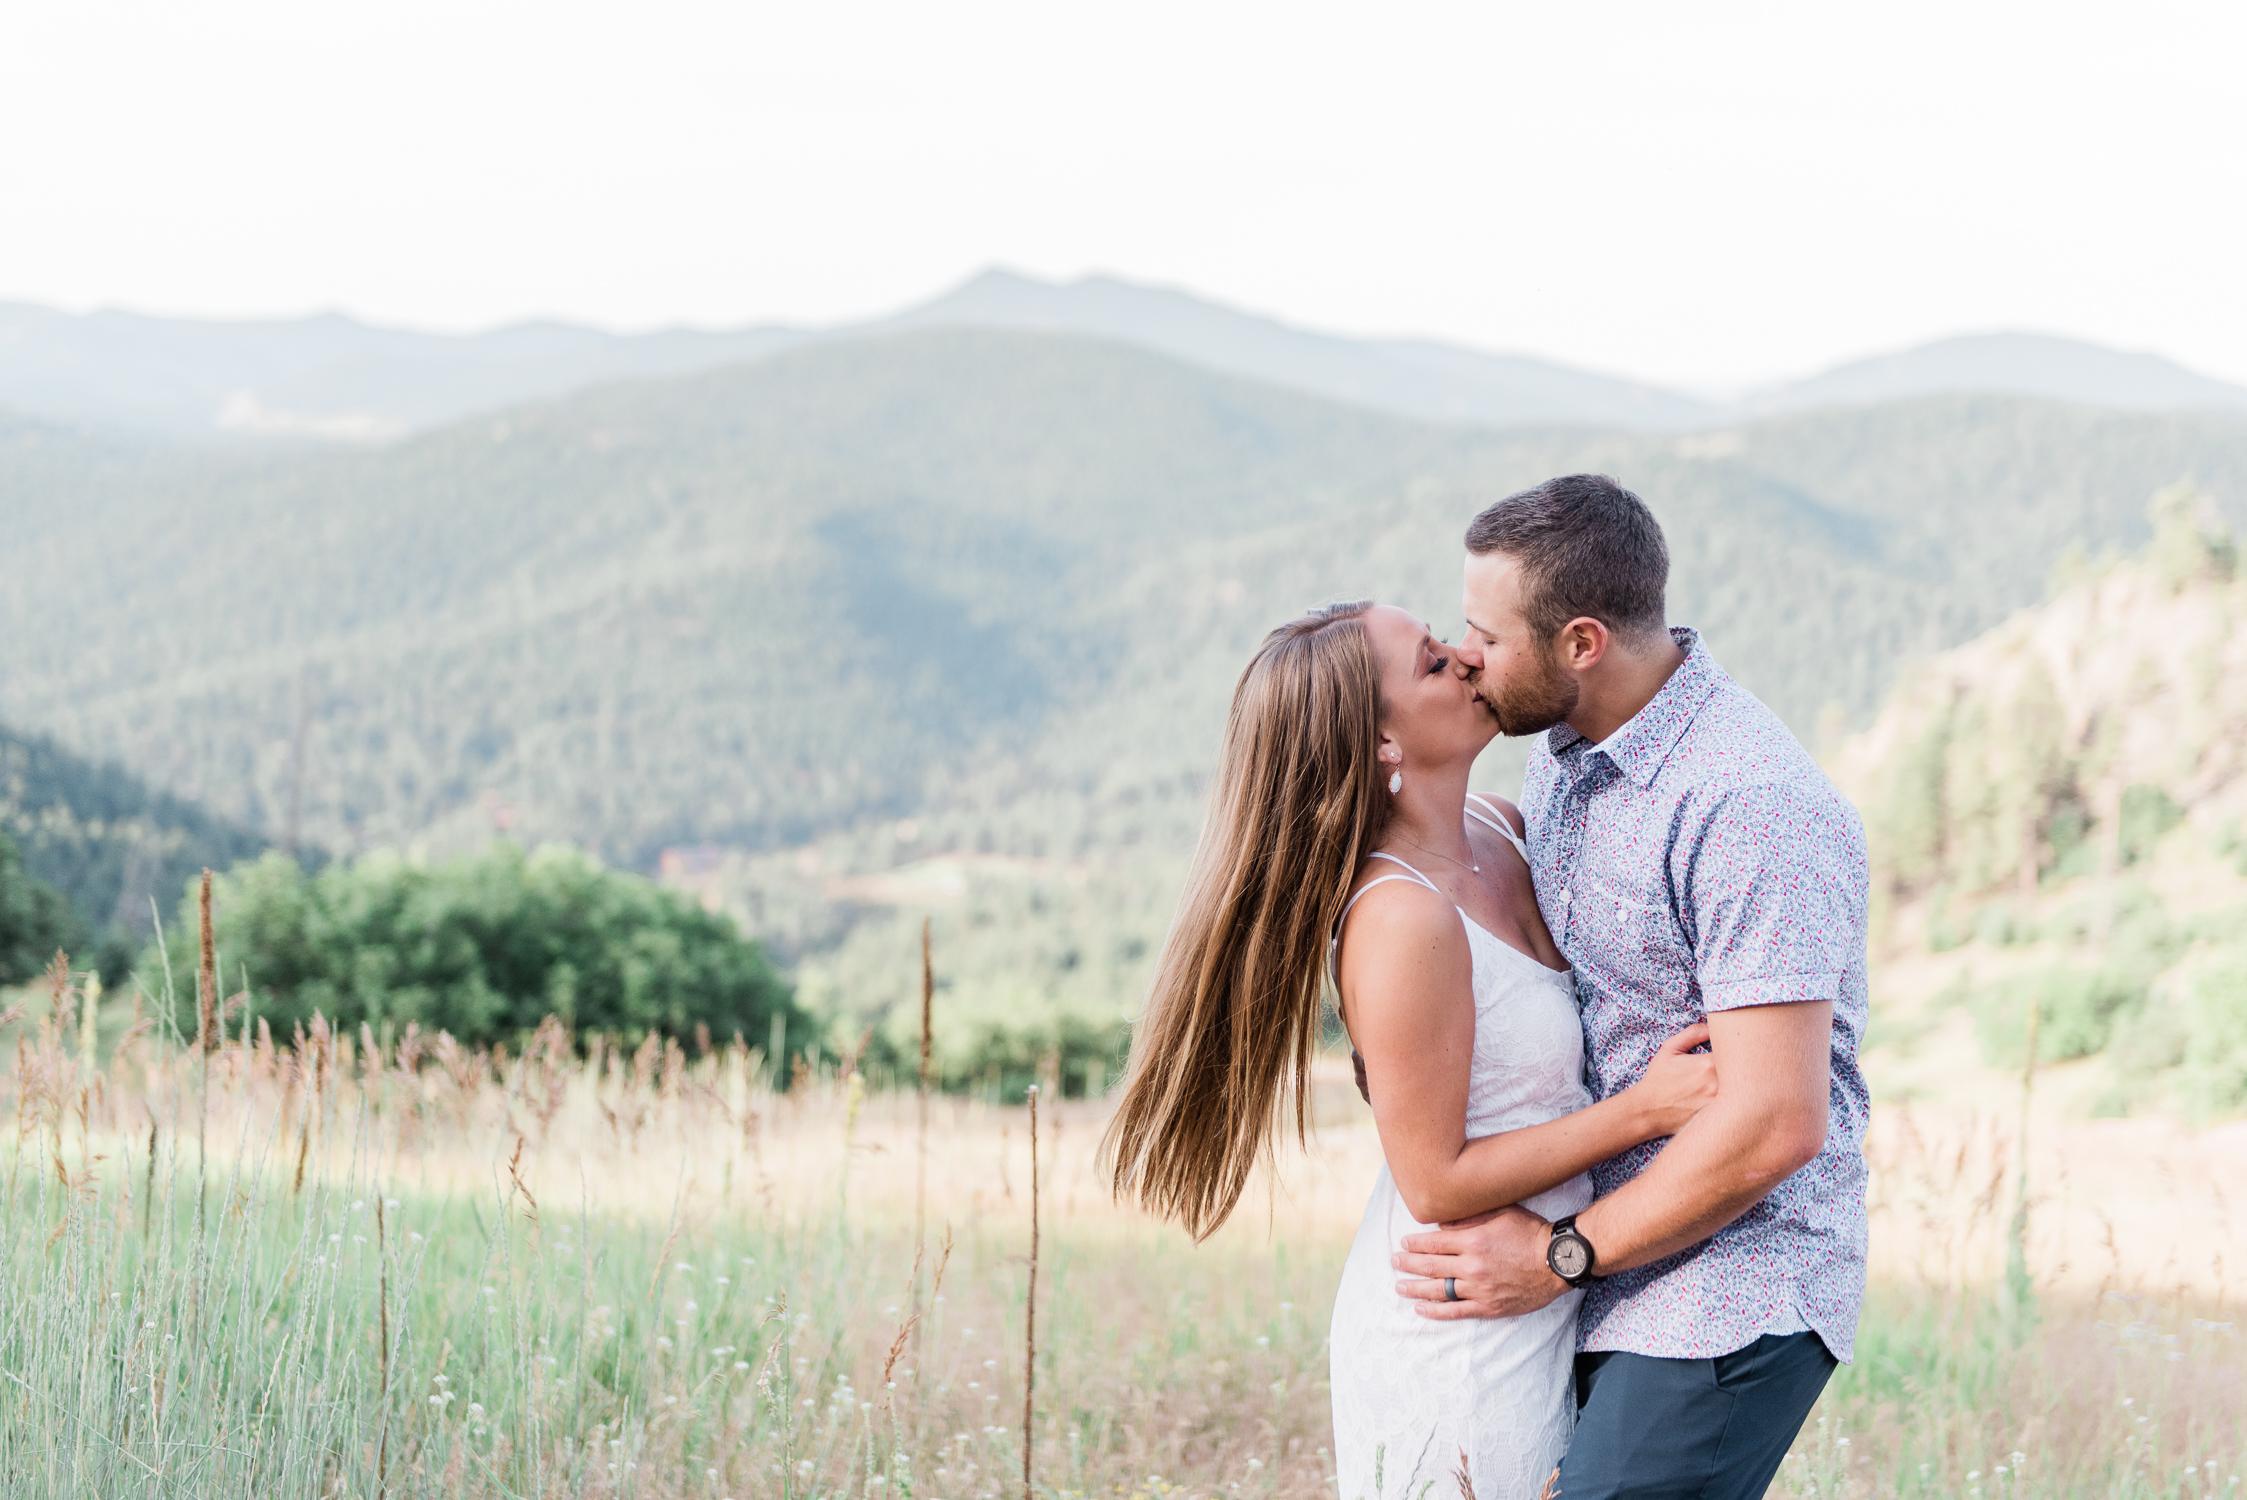 2019-08-30-Engagement-Morgan-Adam-MtFalcon-1795.jpg